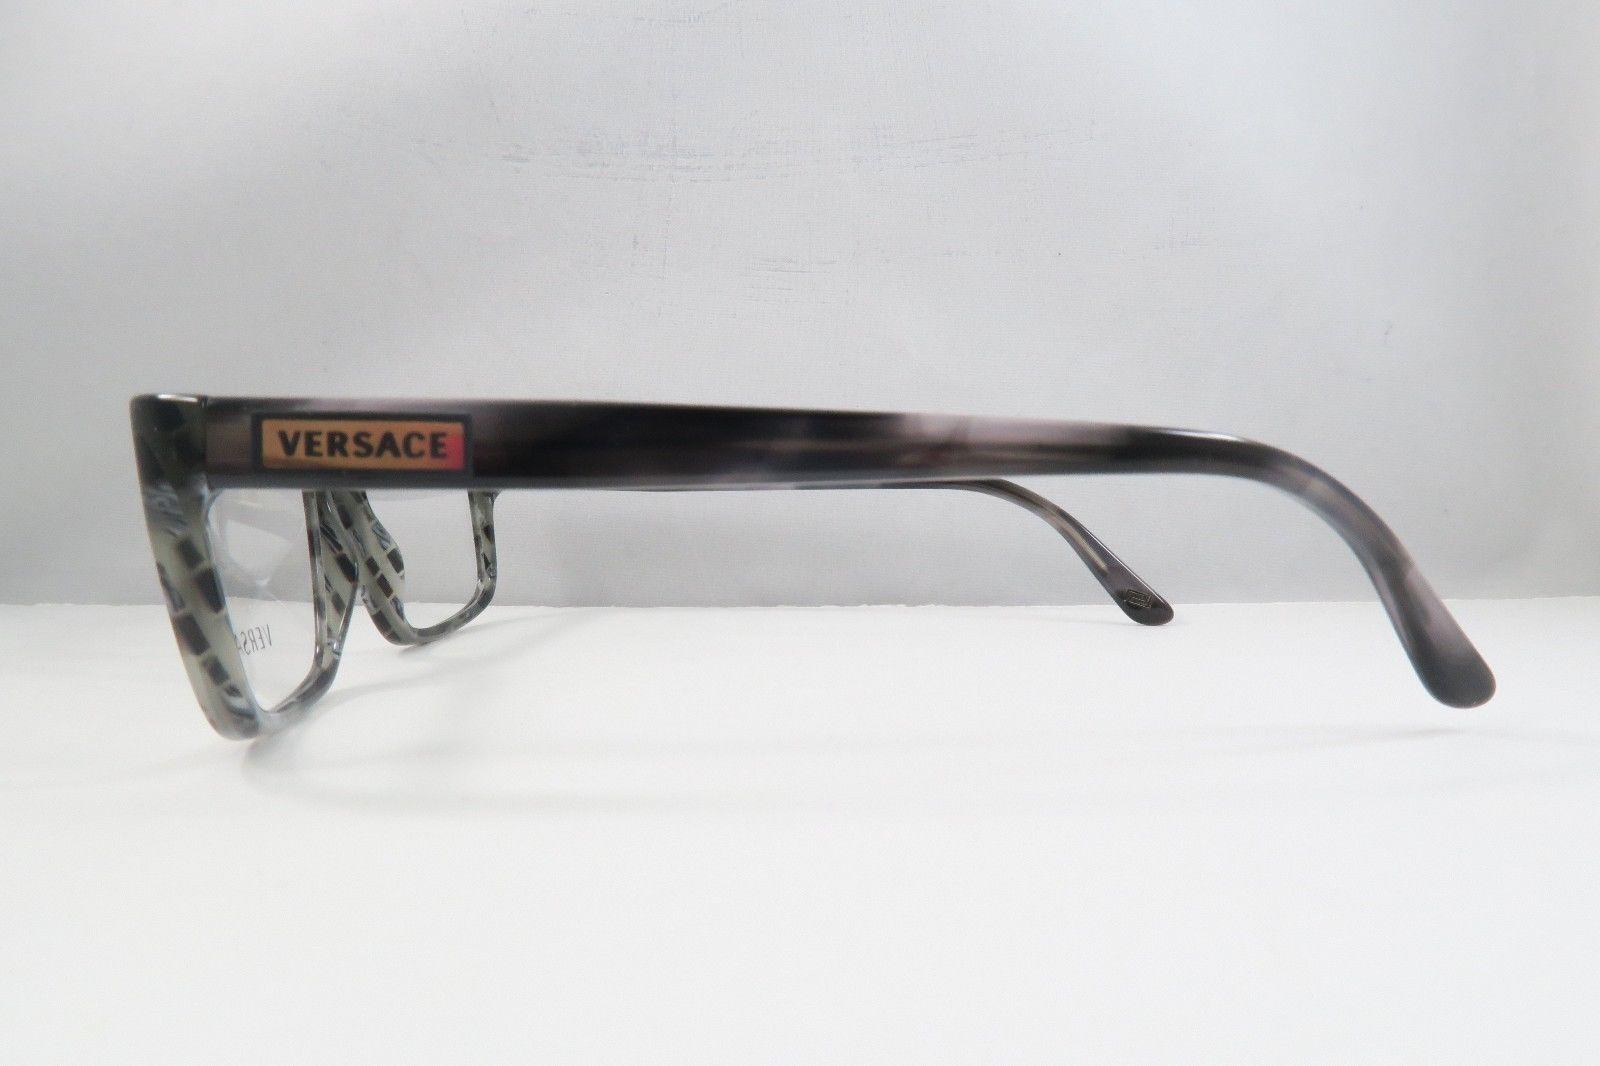 e121d69ed0e Versace MOD 3154 939 Grey   Brown Marble New Eyeglasses 52mm - 104